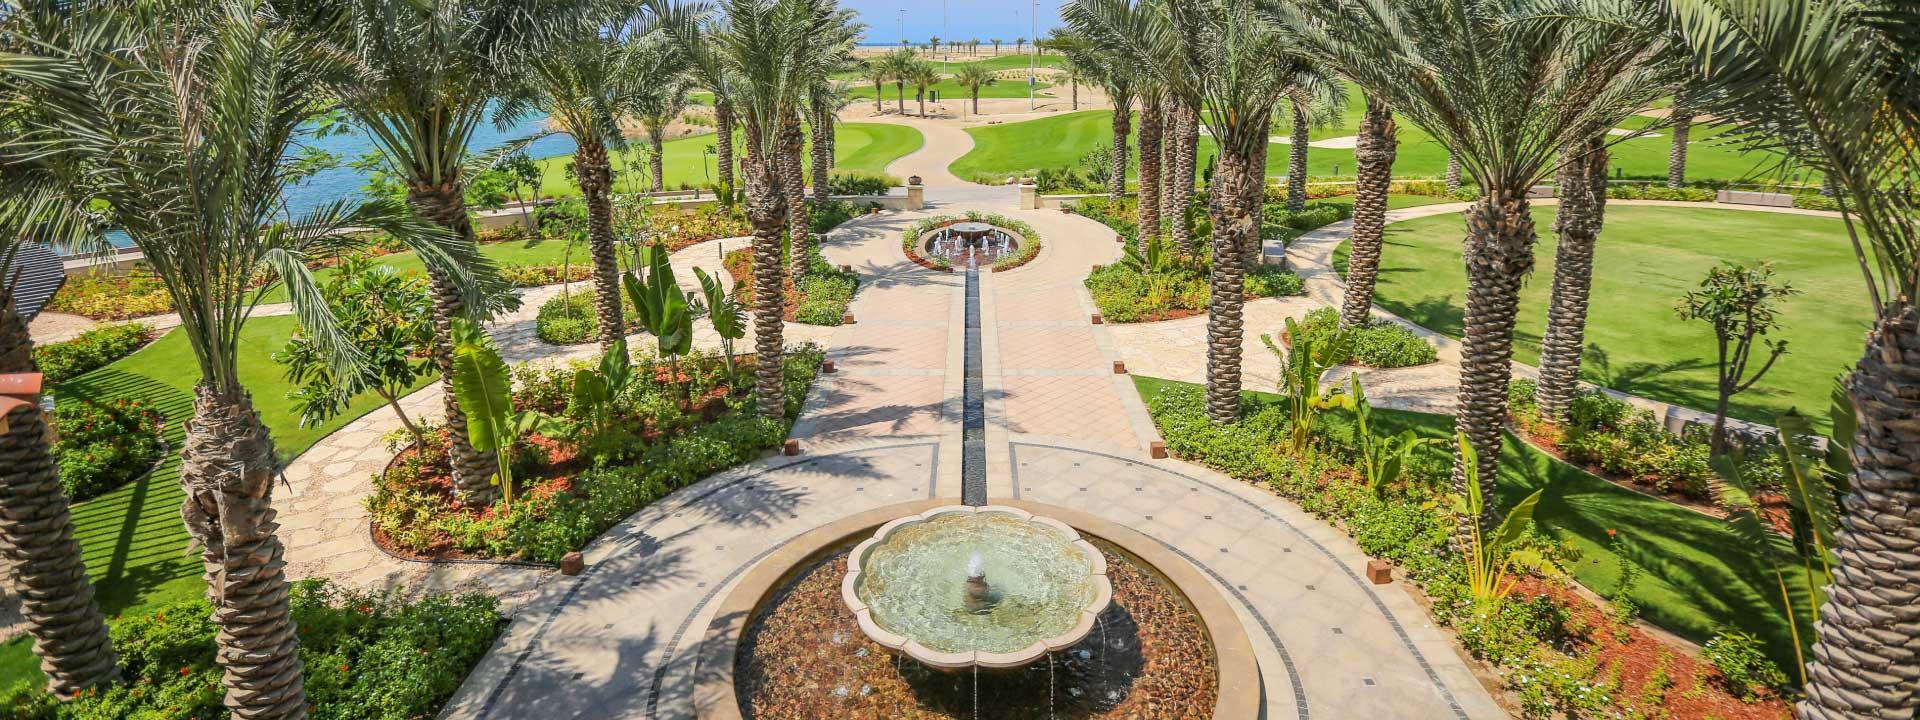 Royal Greens Golf & Country Club Images - Visit KAEC